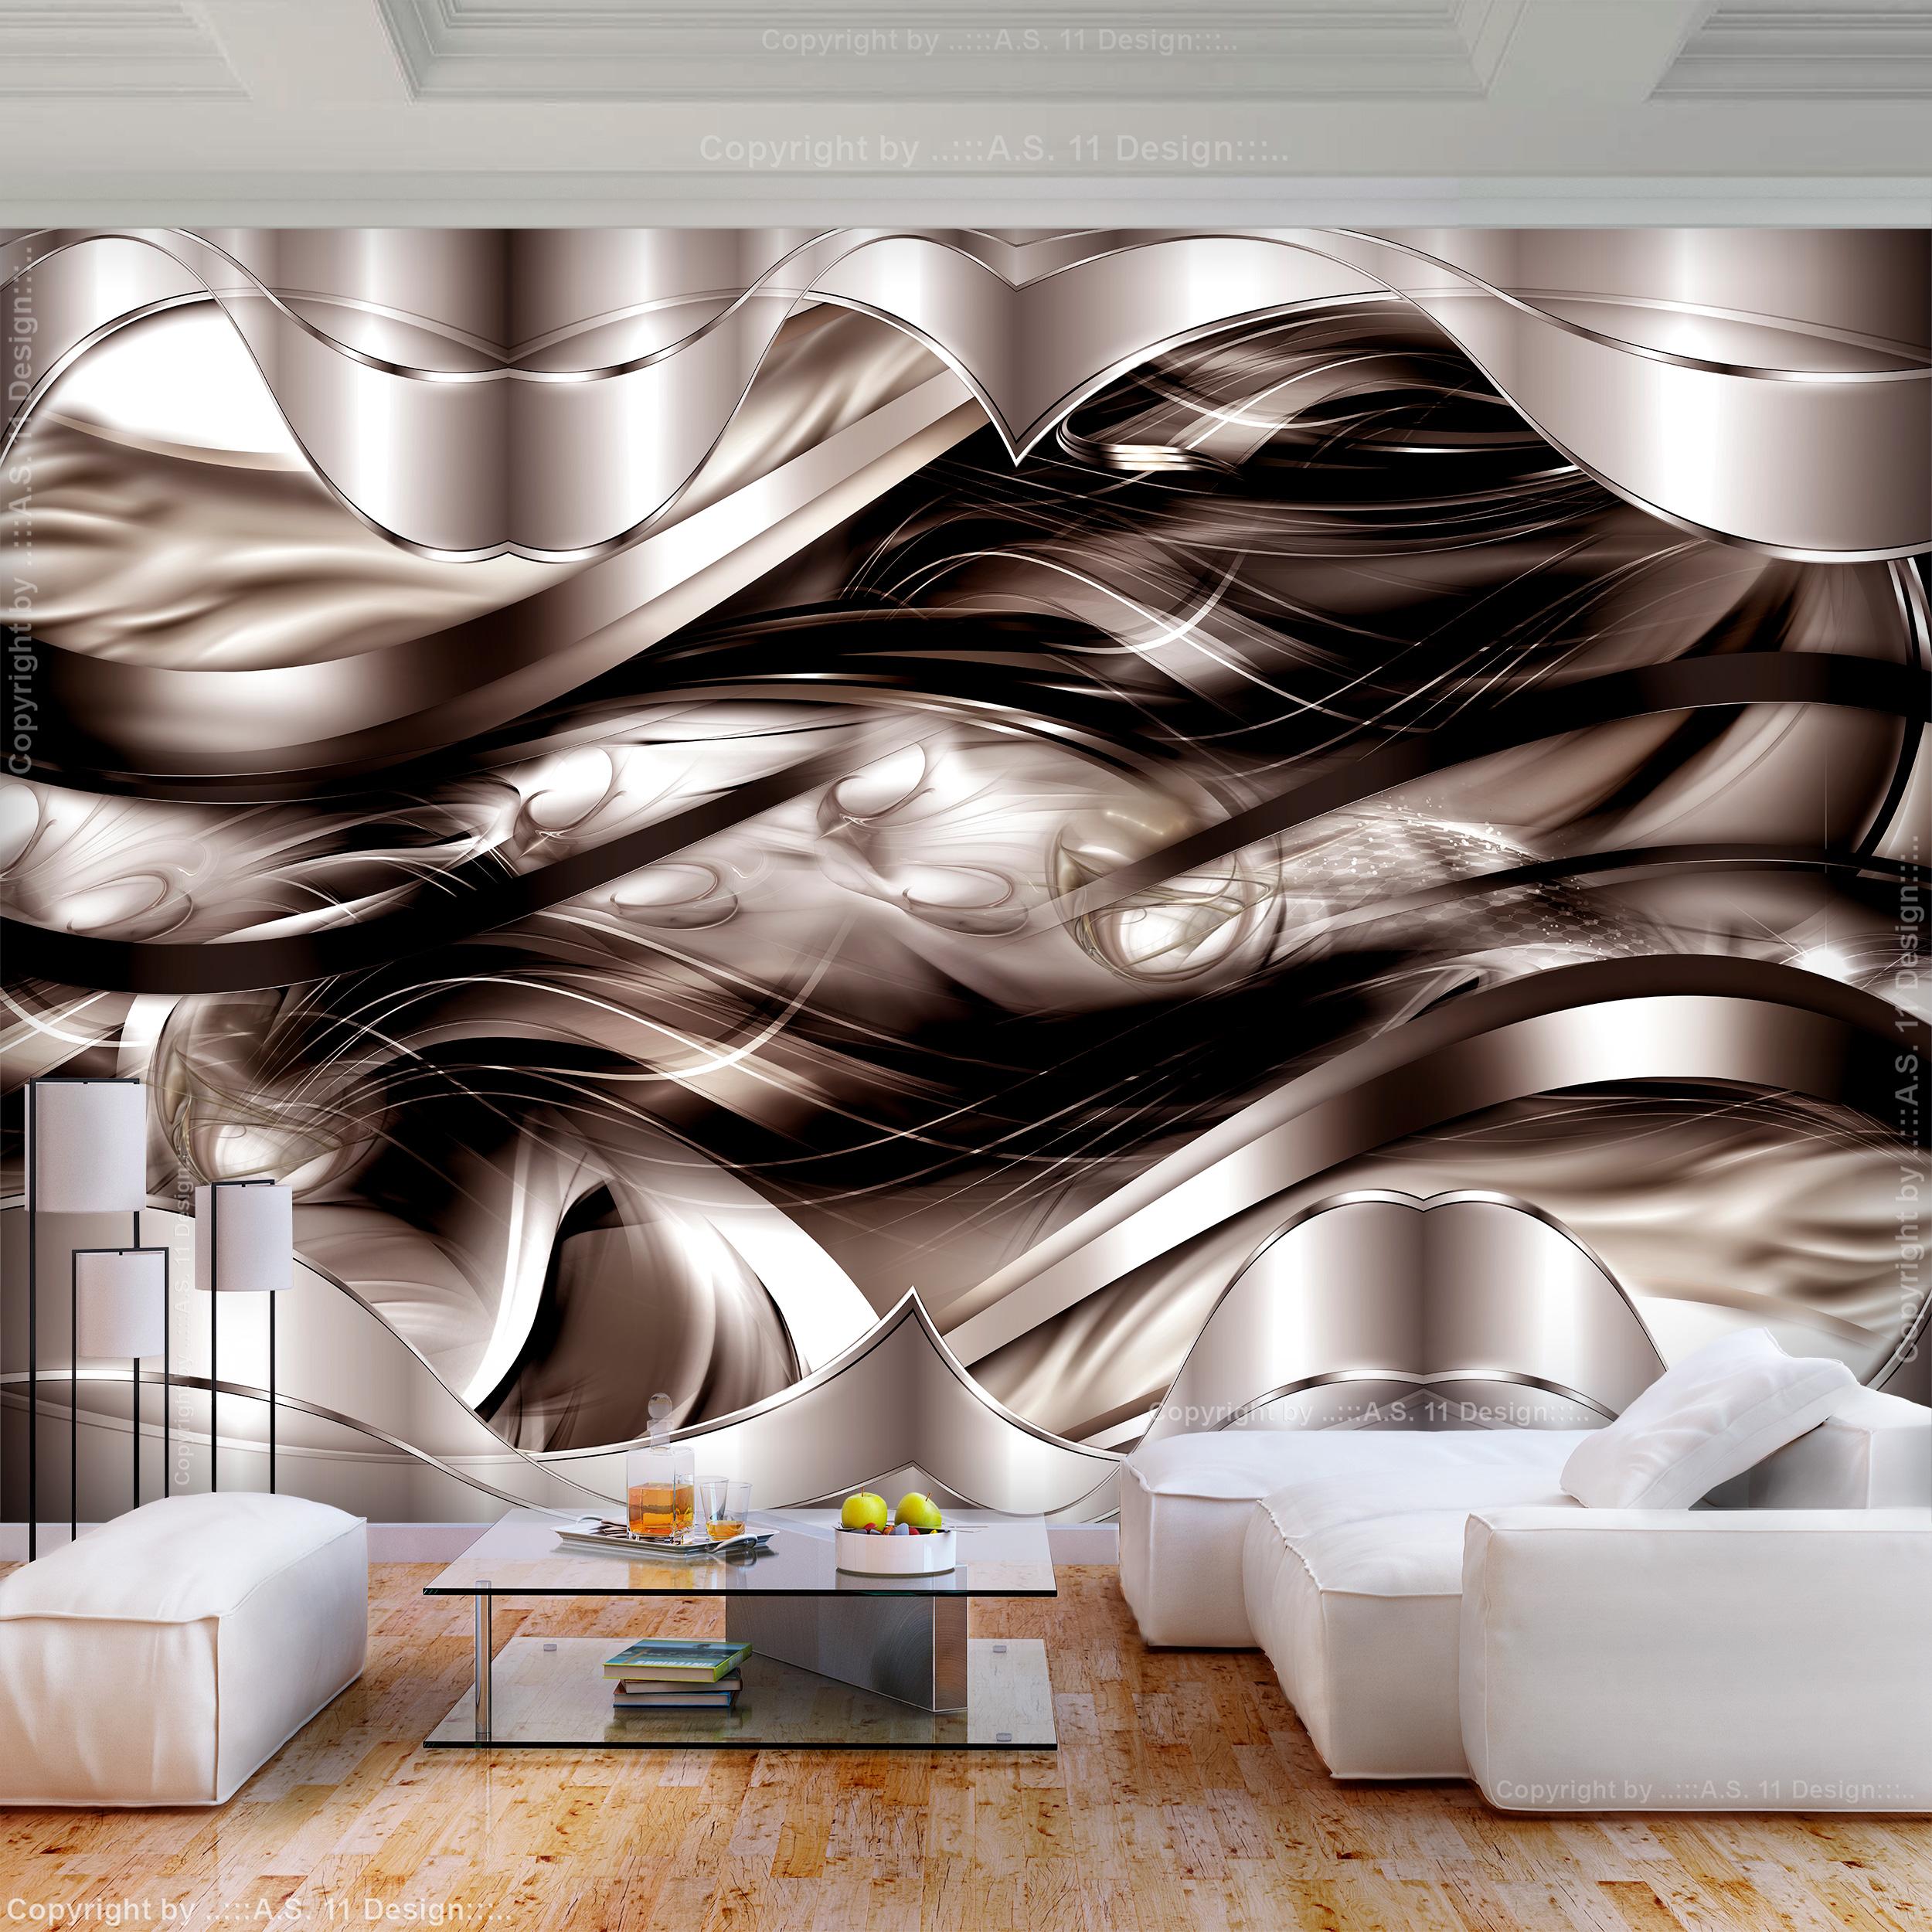 vlies fototapete abstrakt 3d effekt diamant schwarz silber. Black Bedroom Furniture Sets. Home Design Ideas